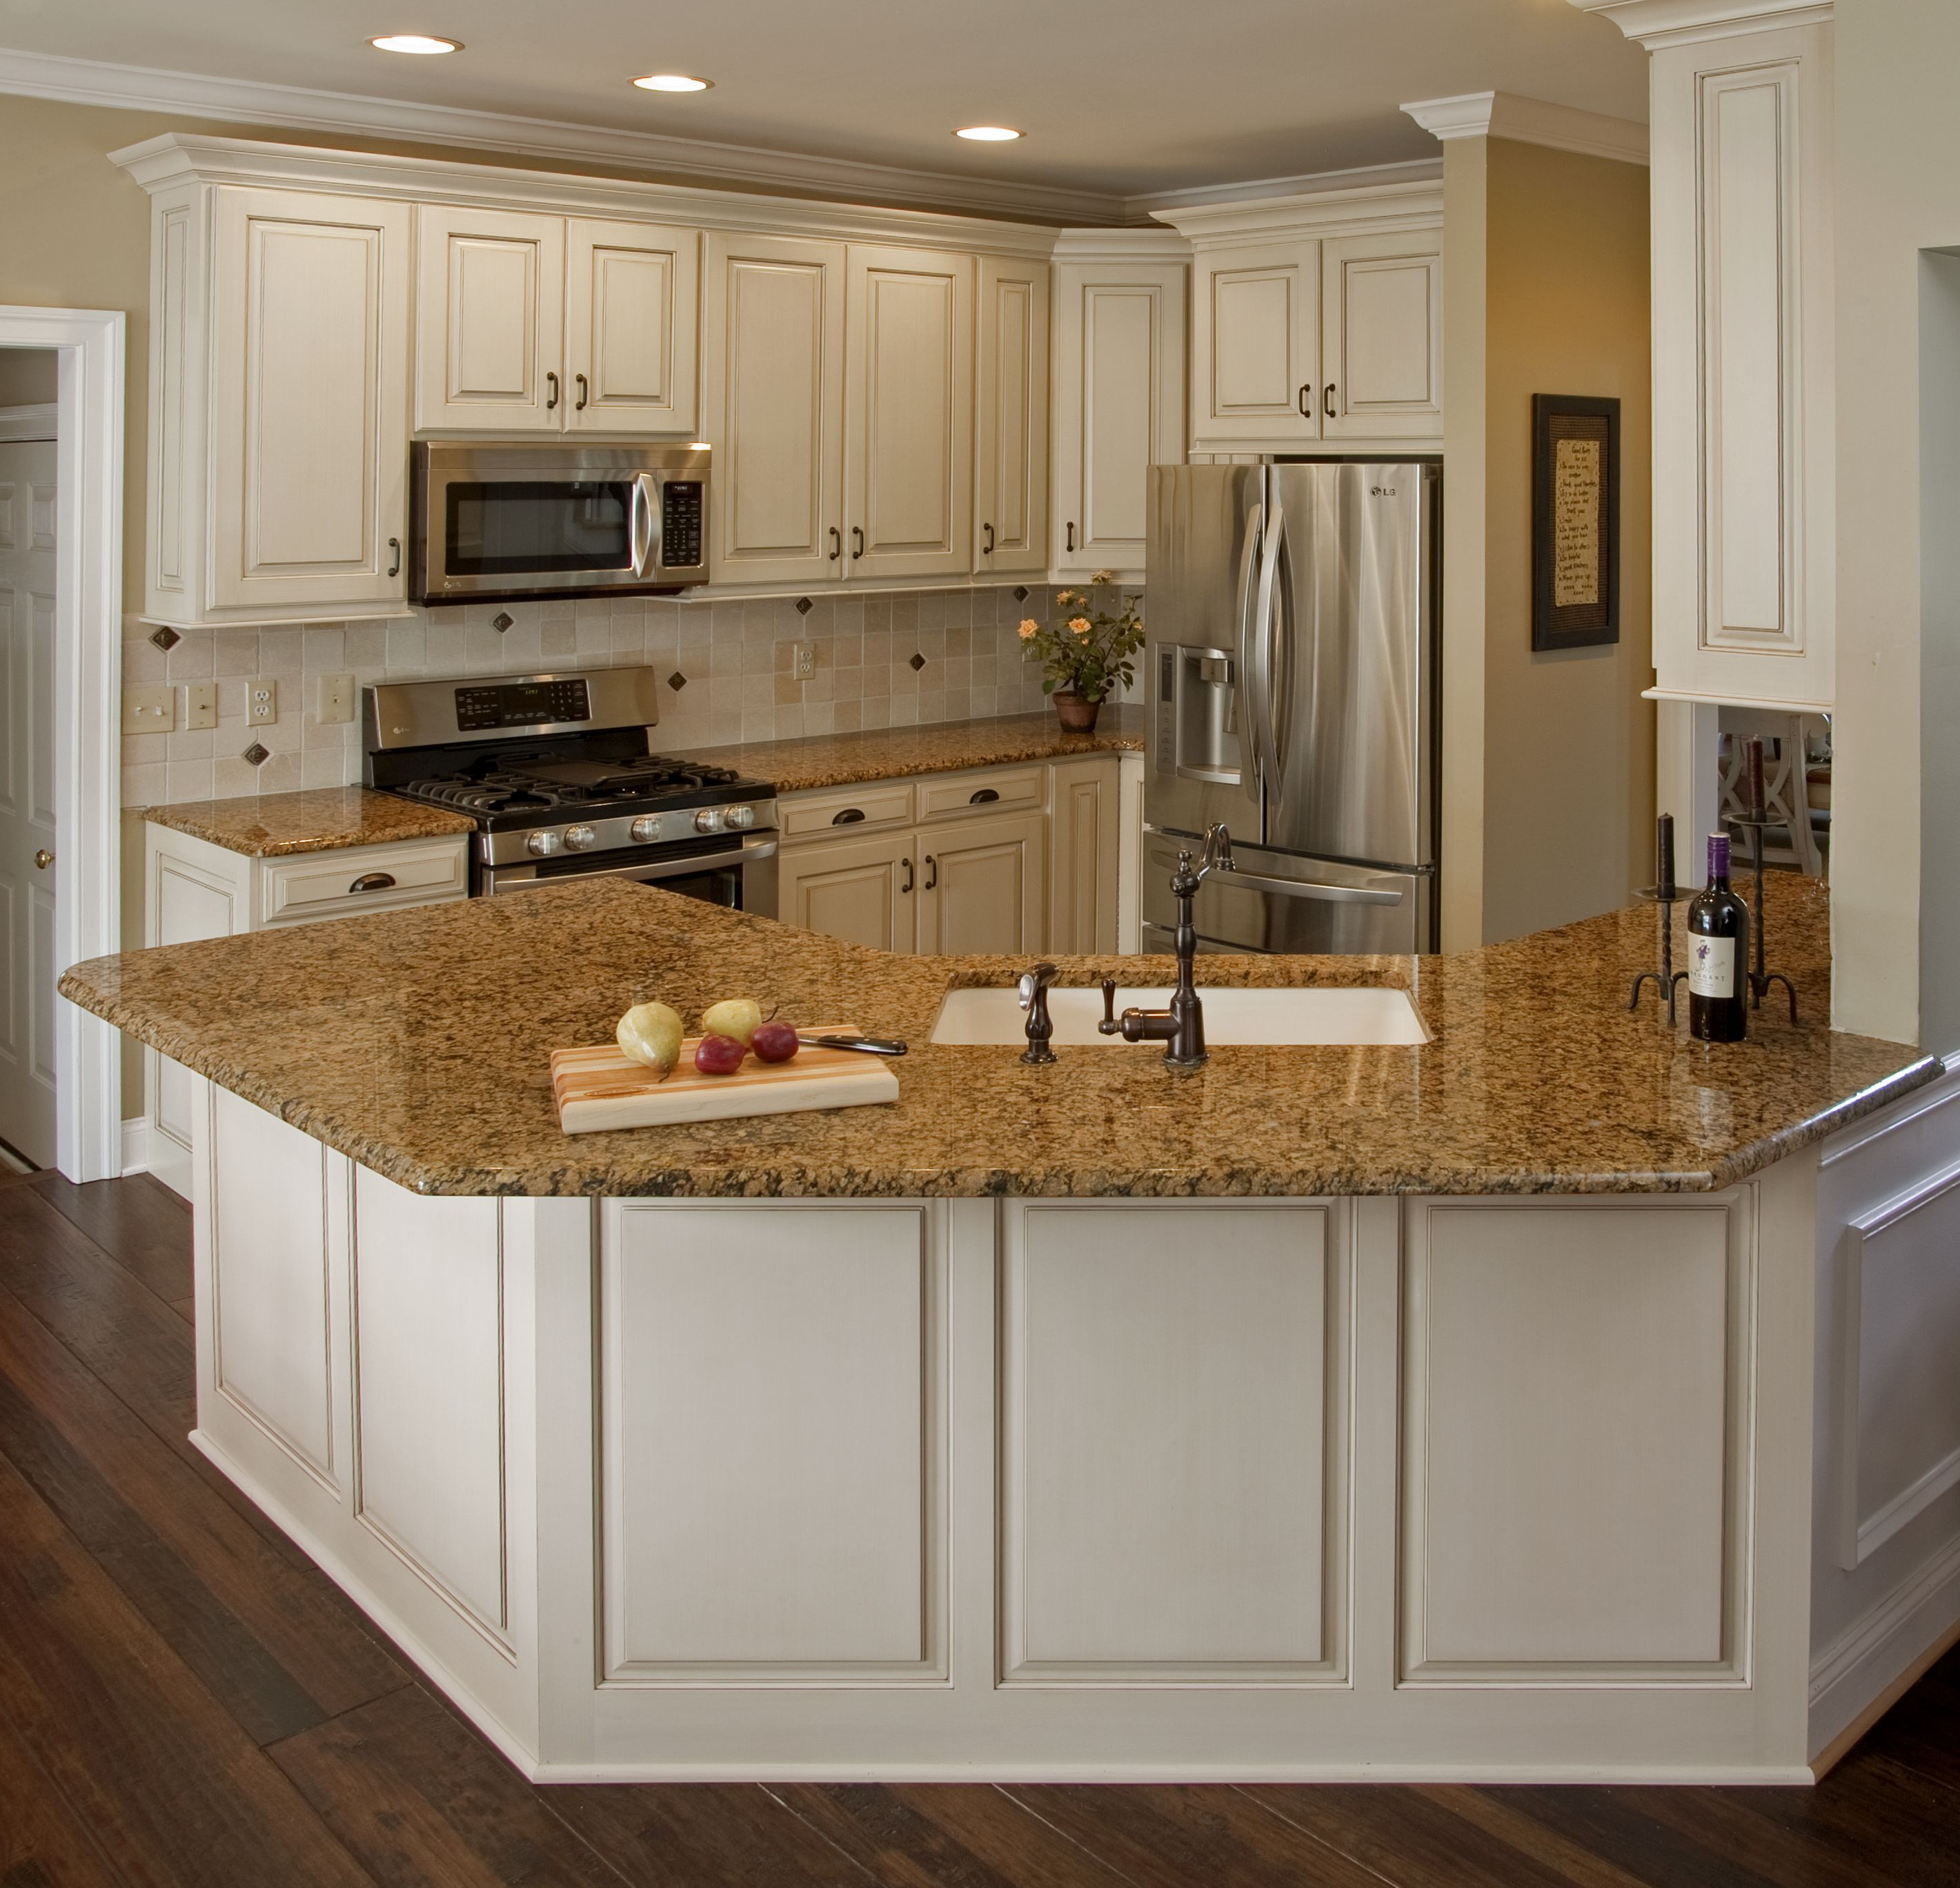 Home And Garden Kitchen Designs Hutch Buffet Design Idea 39s Cabinet